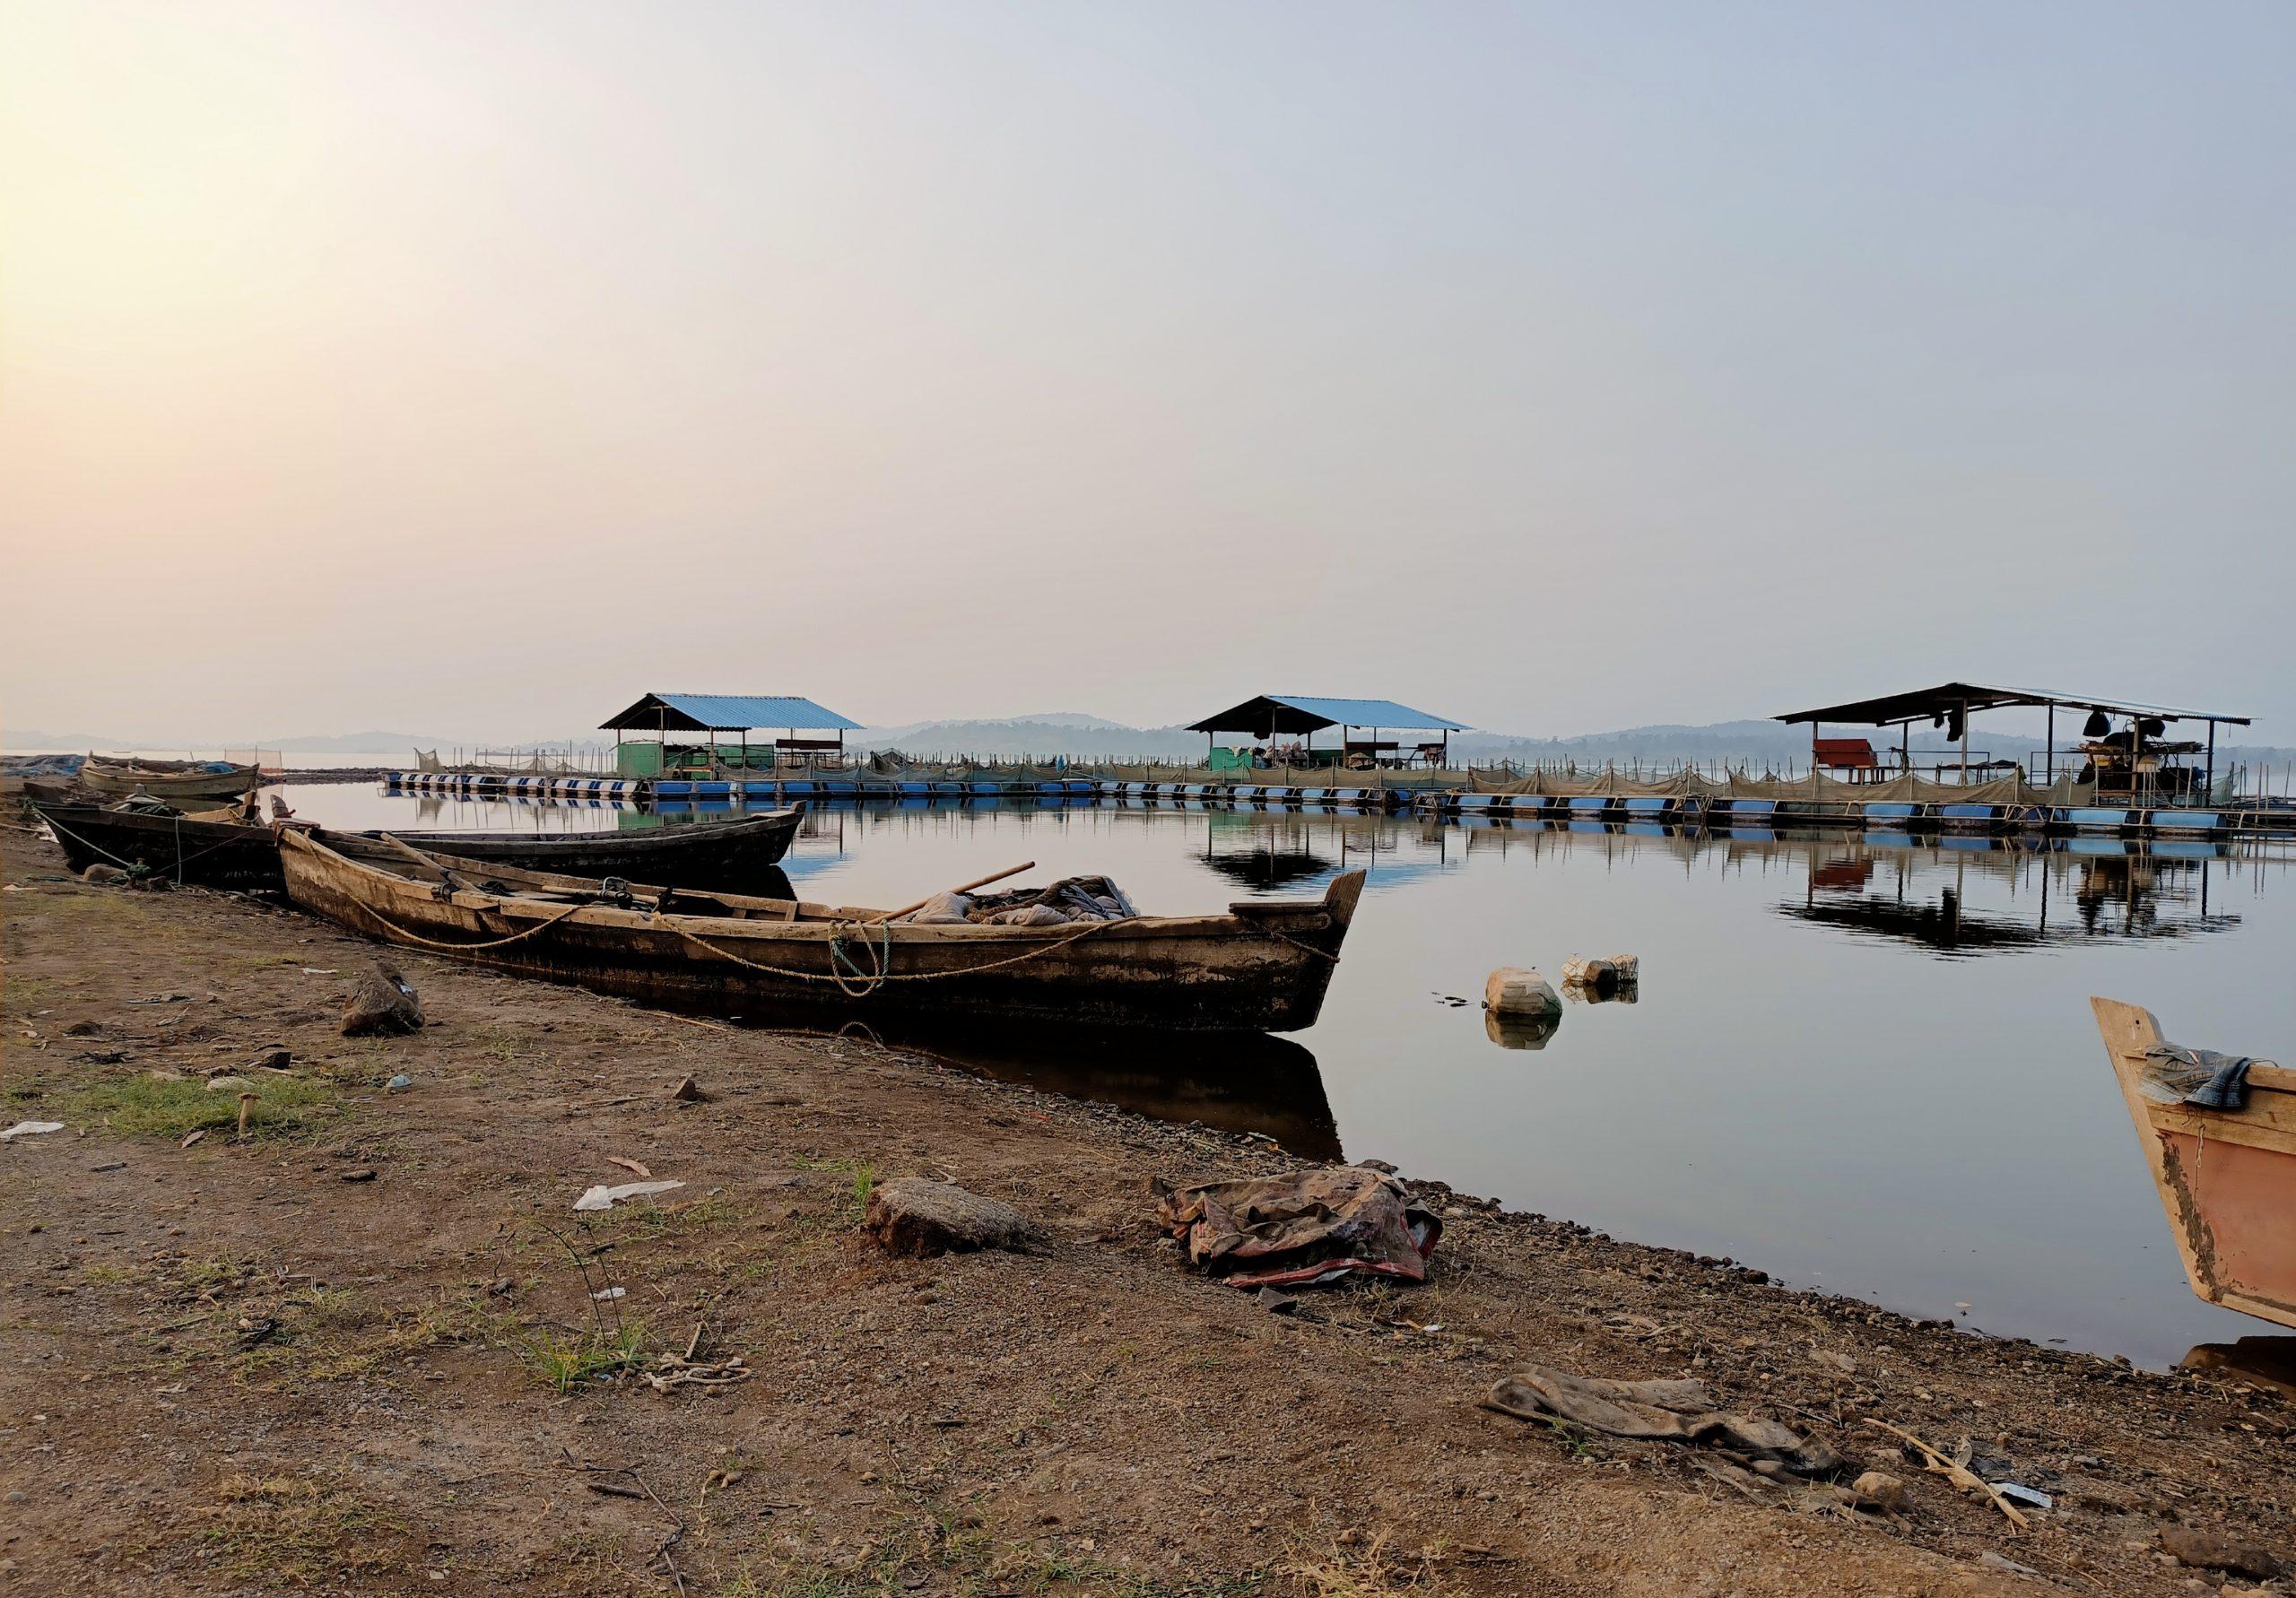 Boats at a port